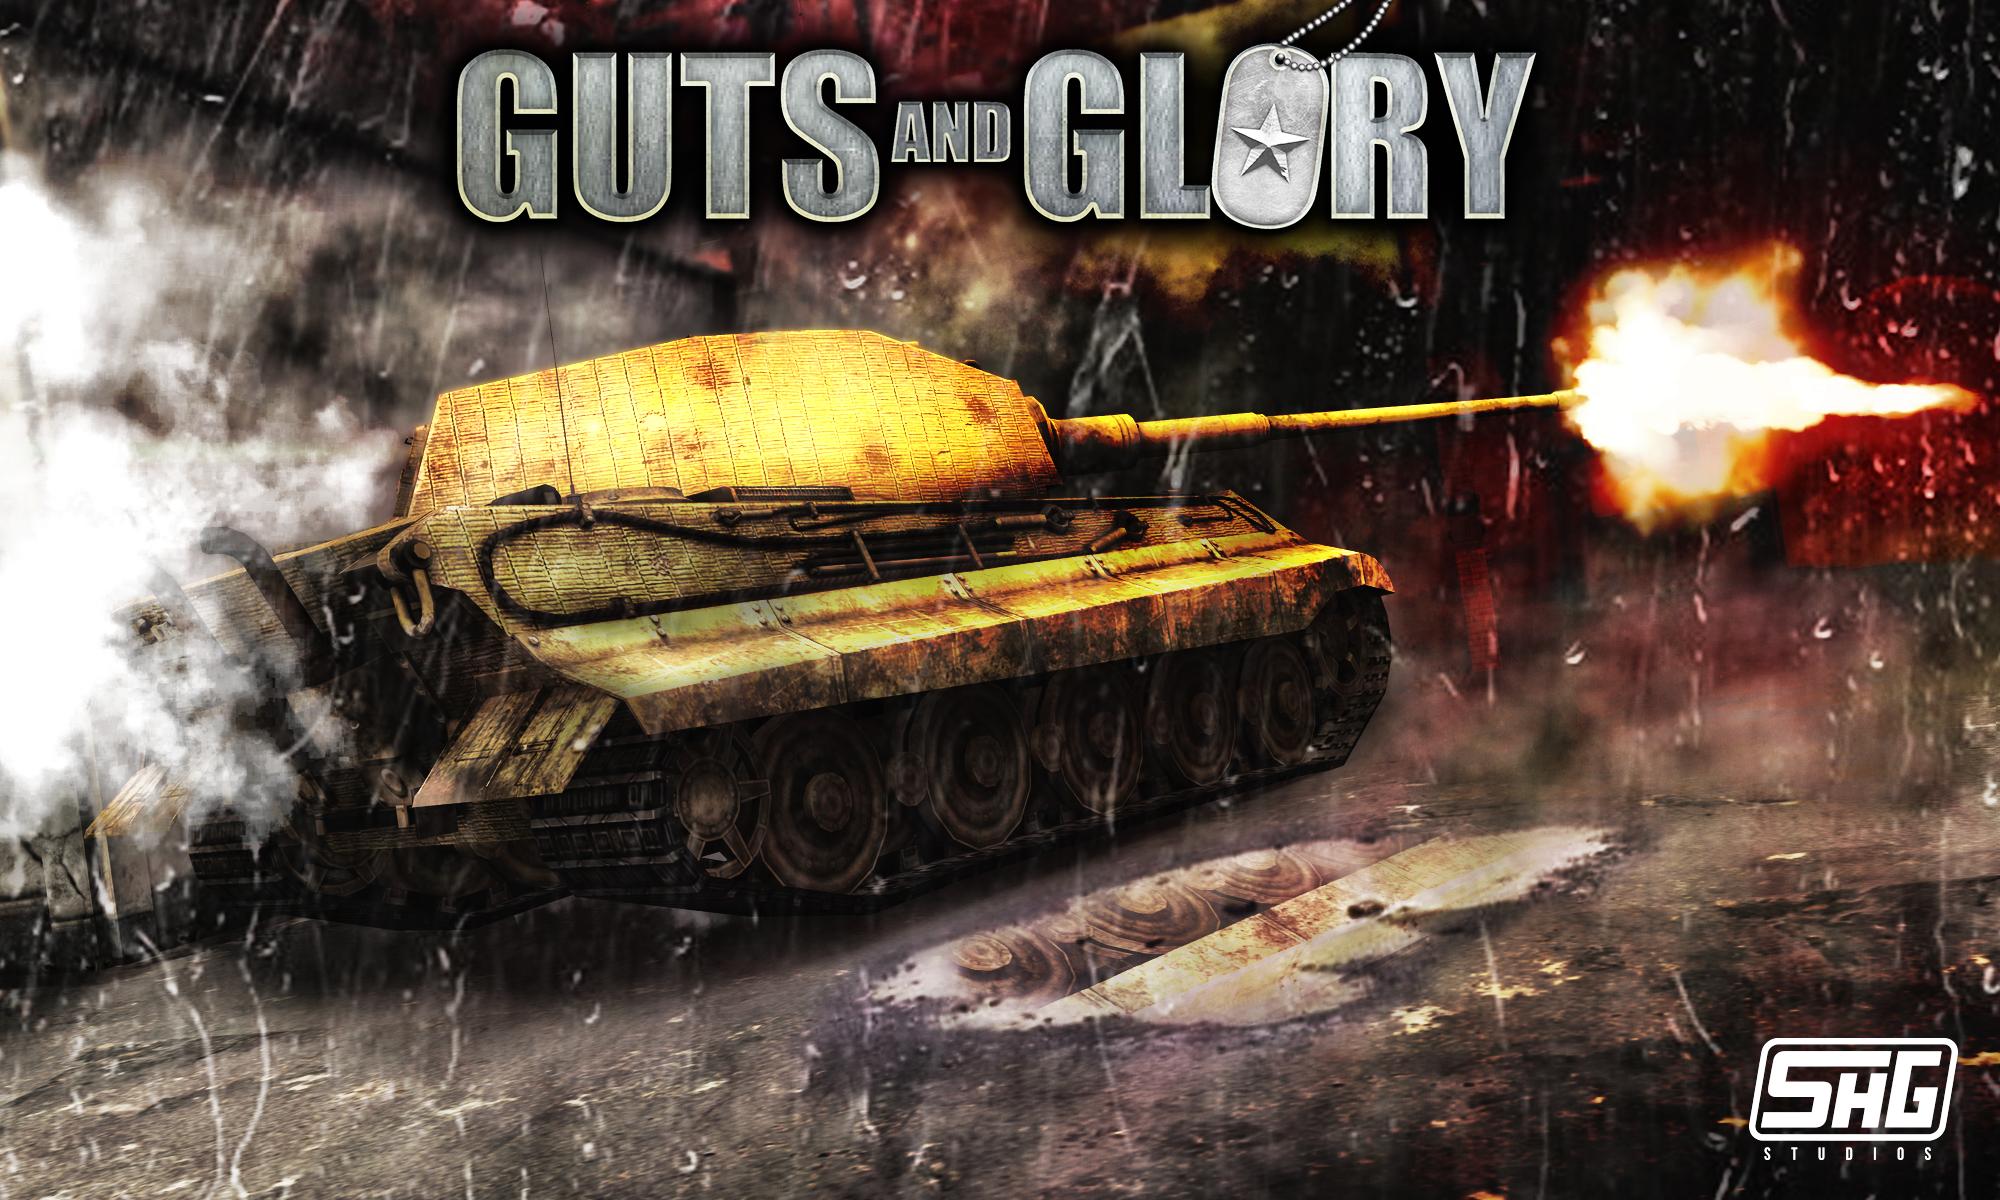 Squads and Glory